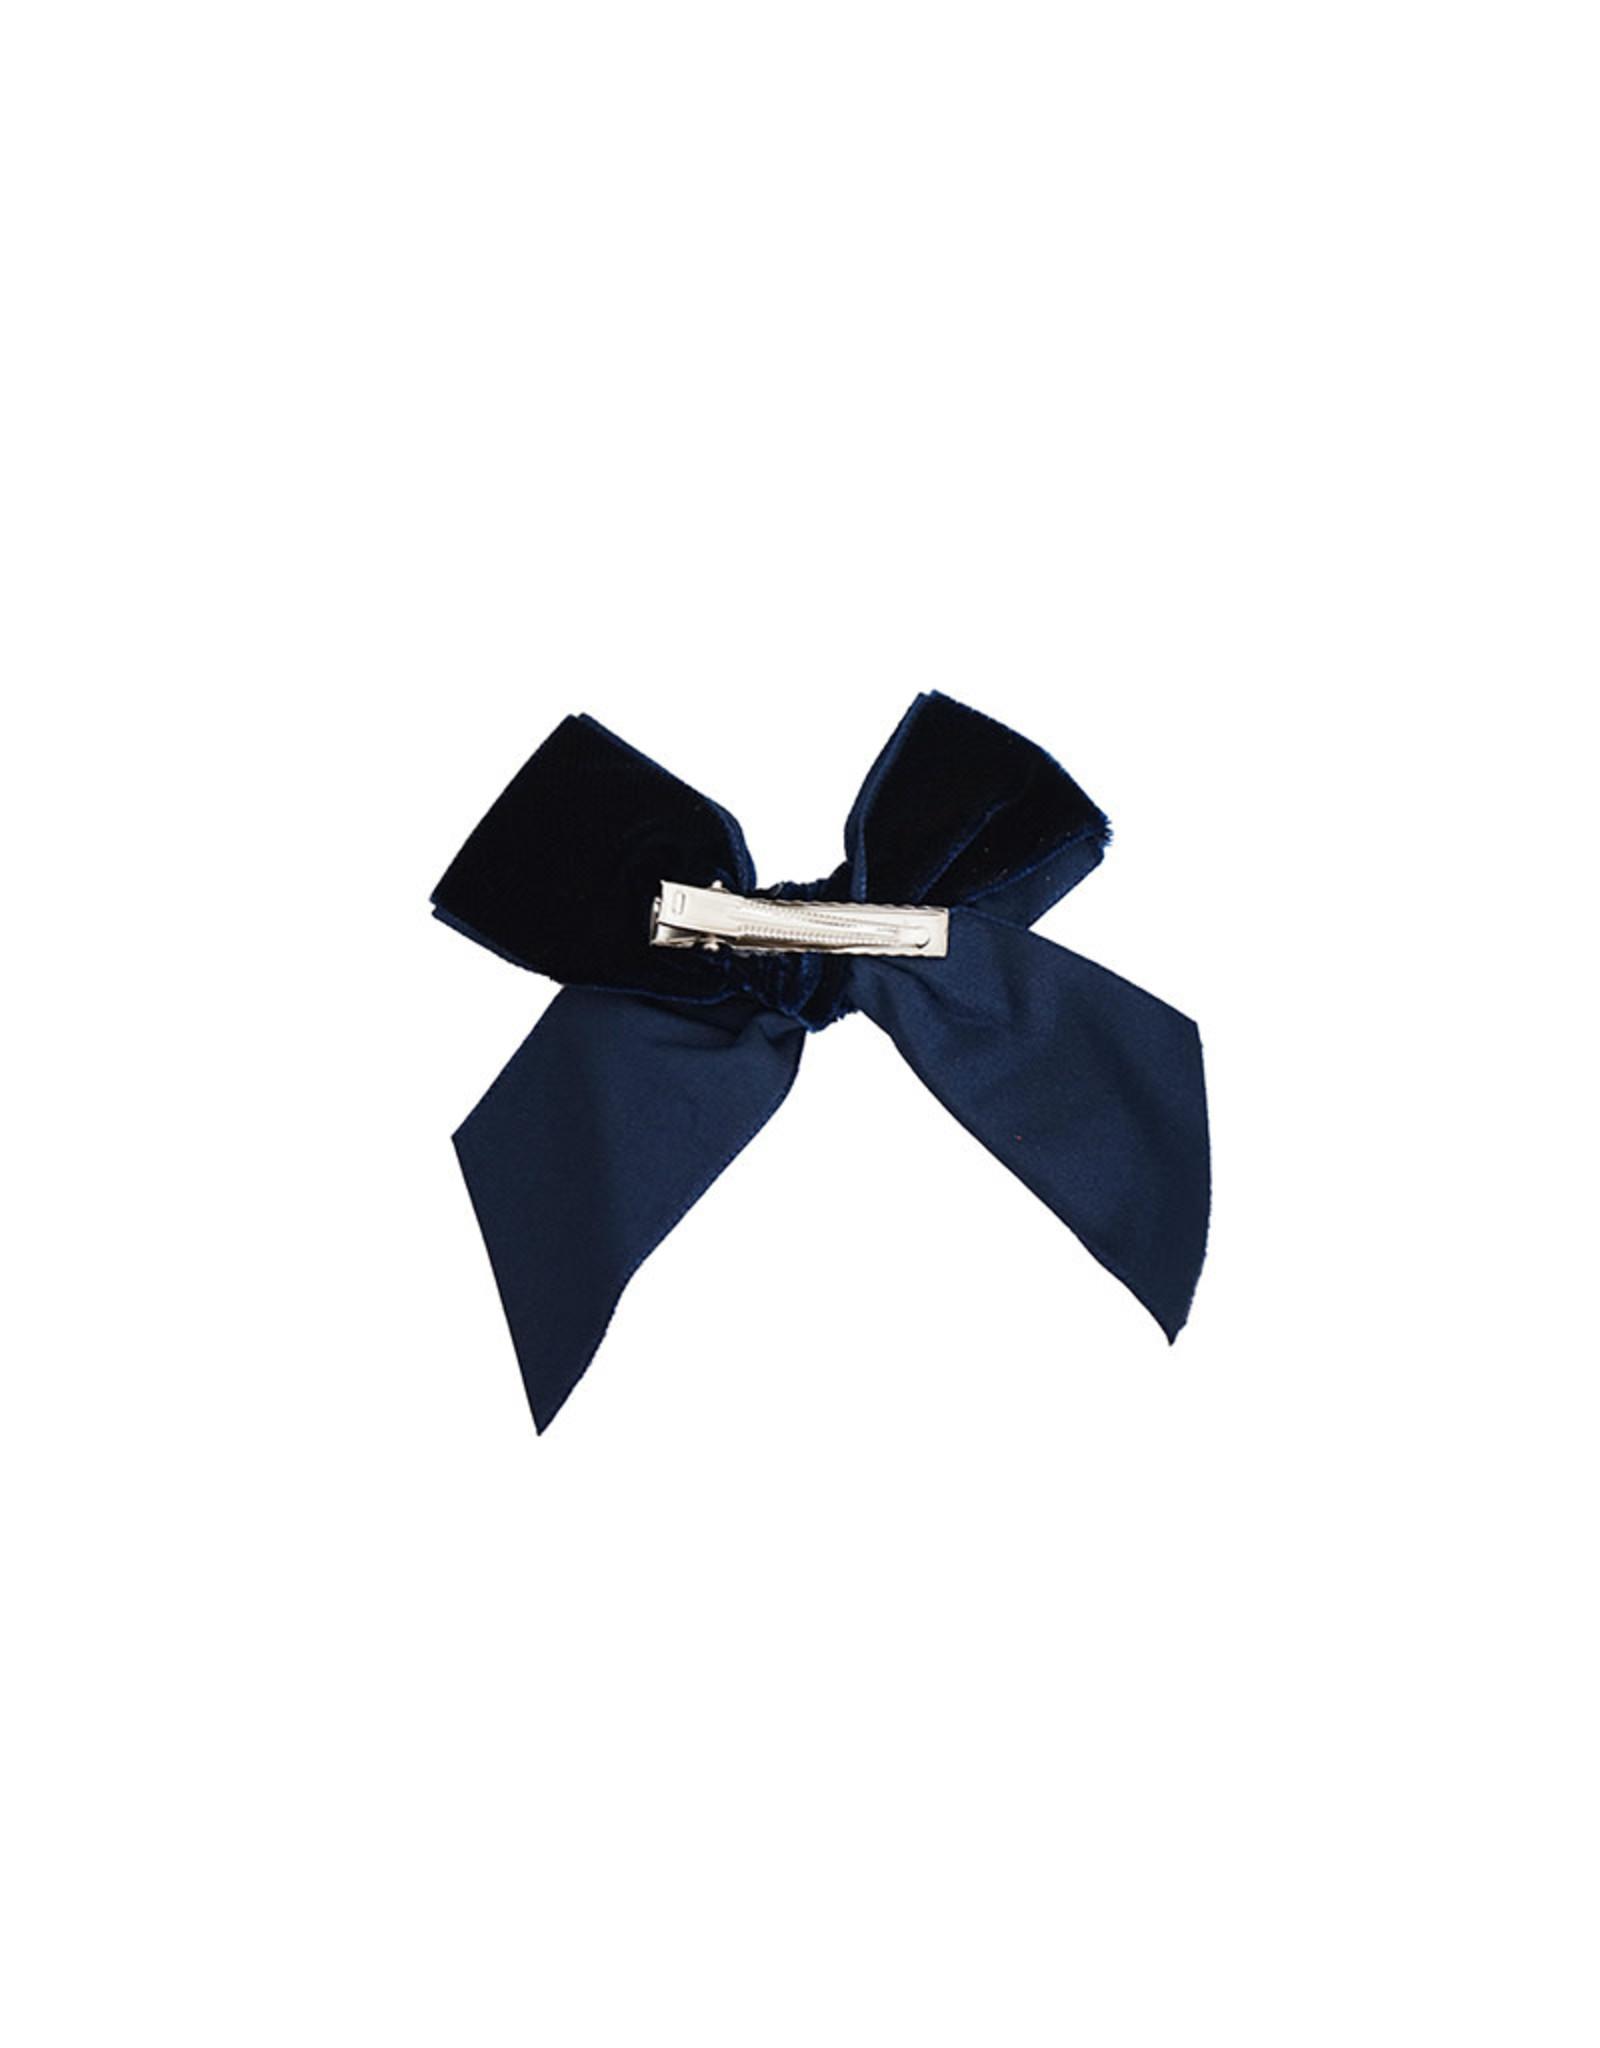 CONDOR Navy Velvet Hair Bow